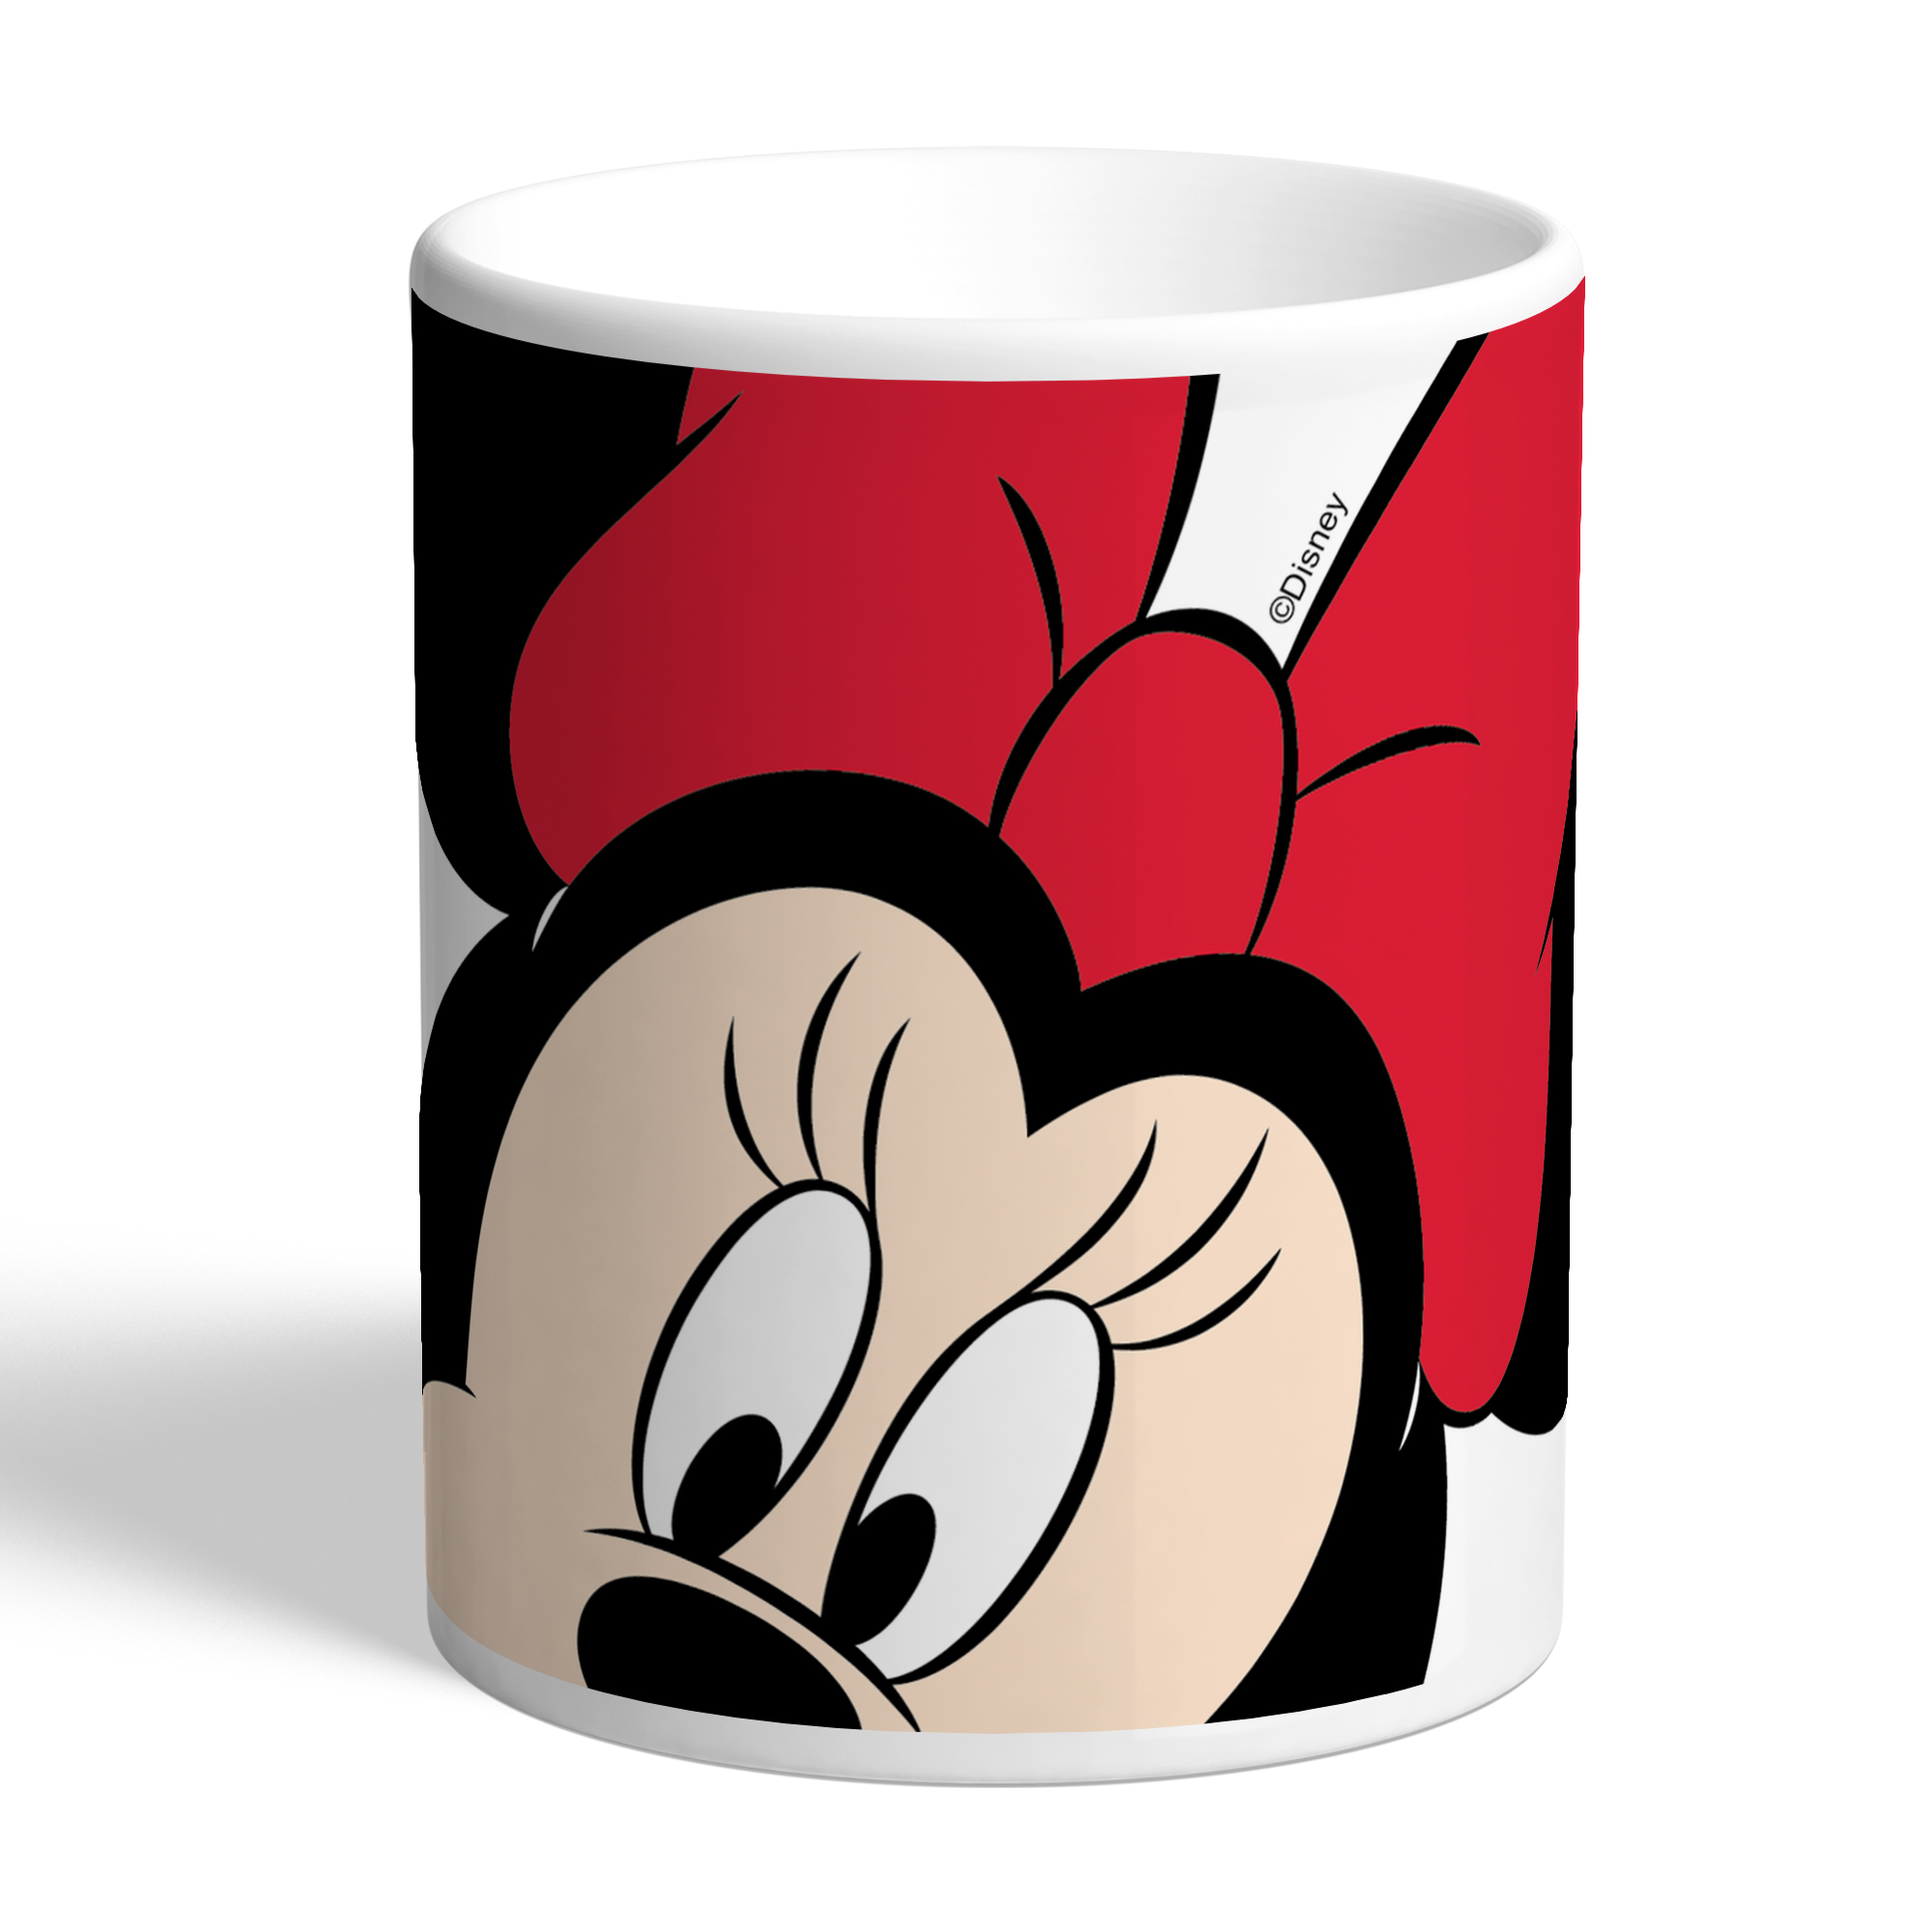 Disney Mickey Mouse & Friends Minnie Mug